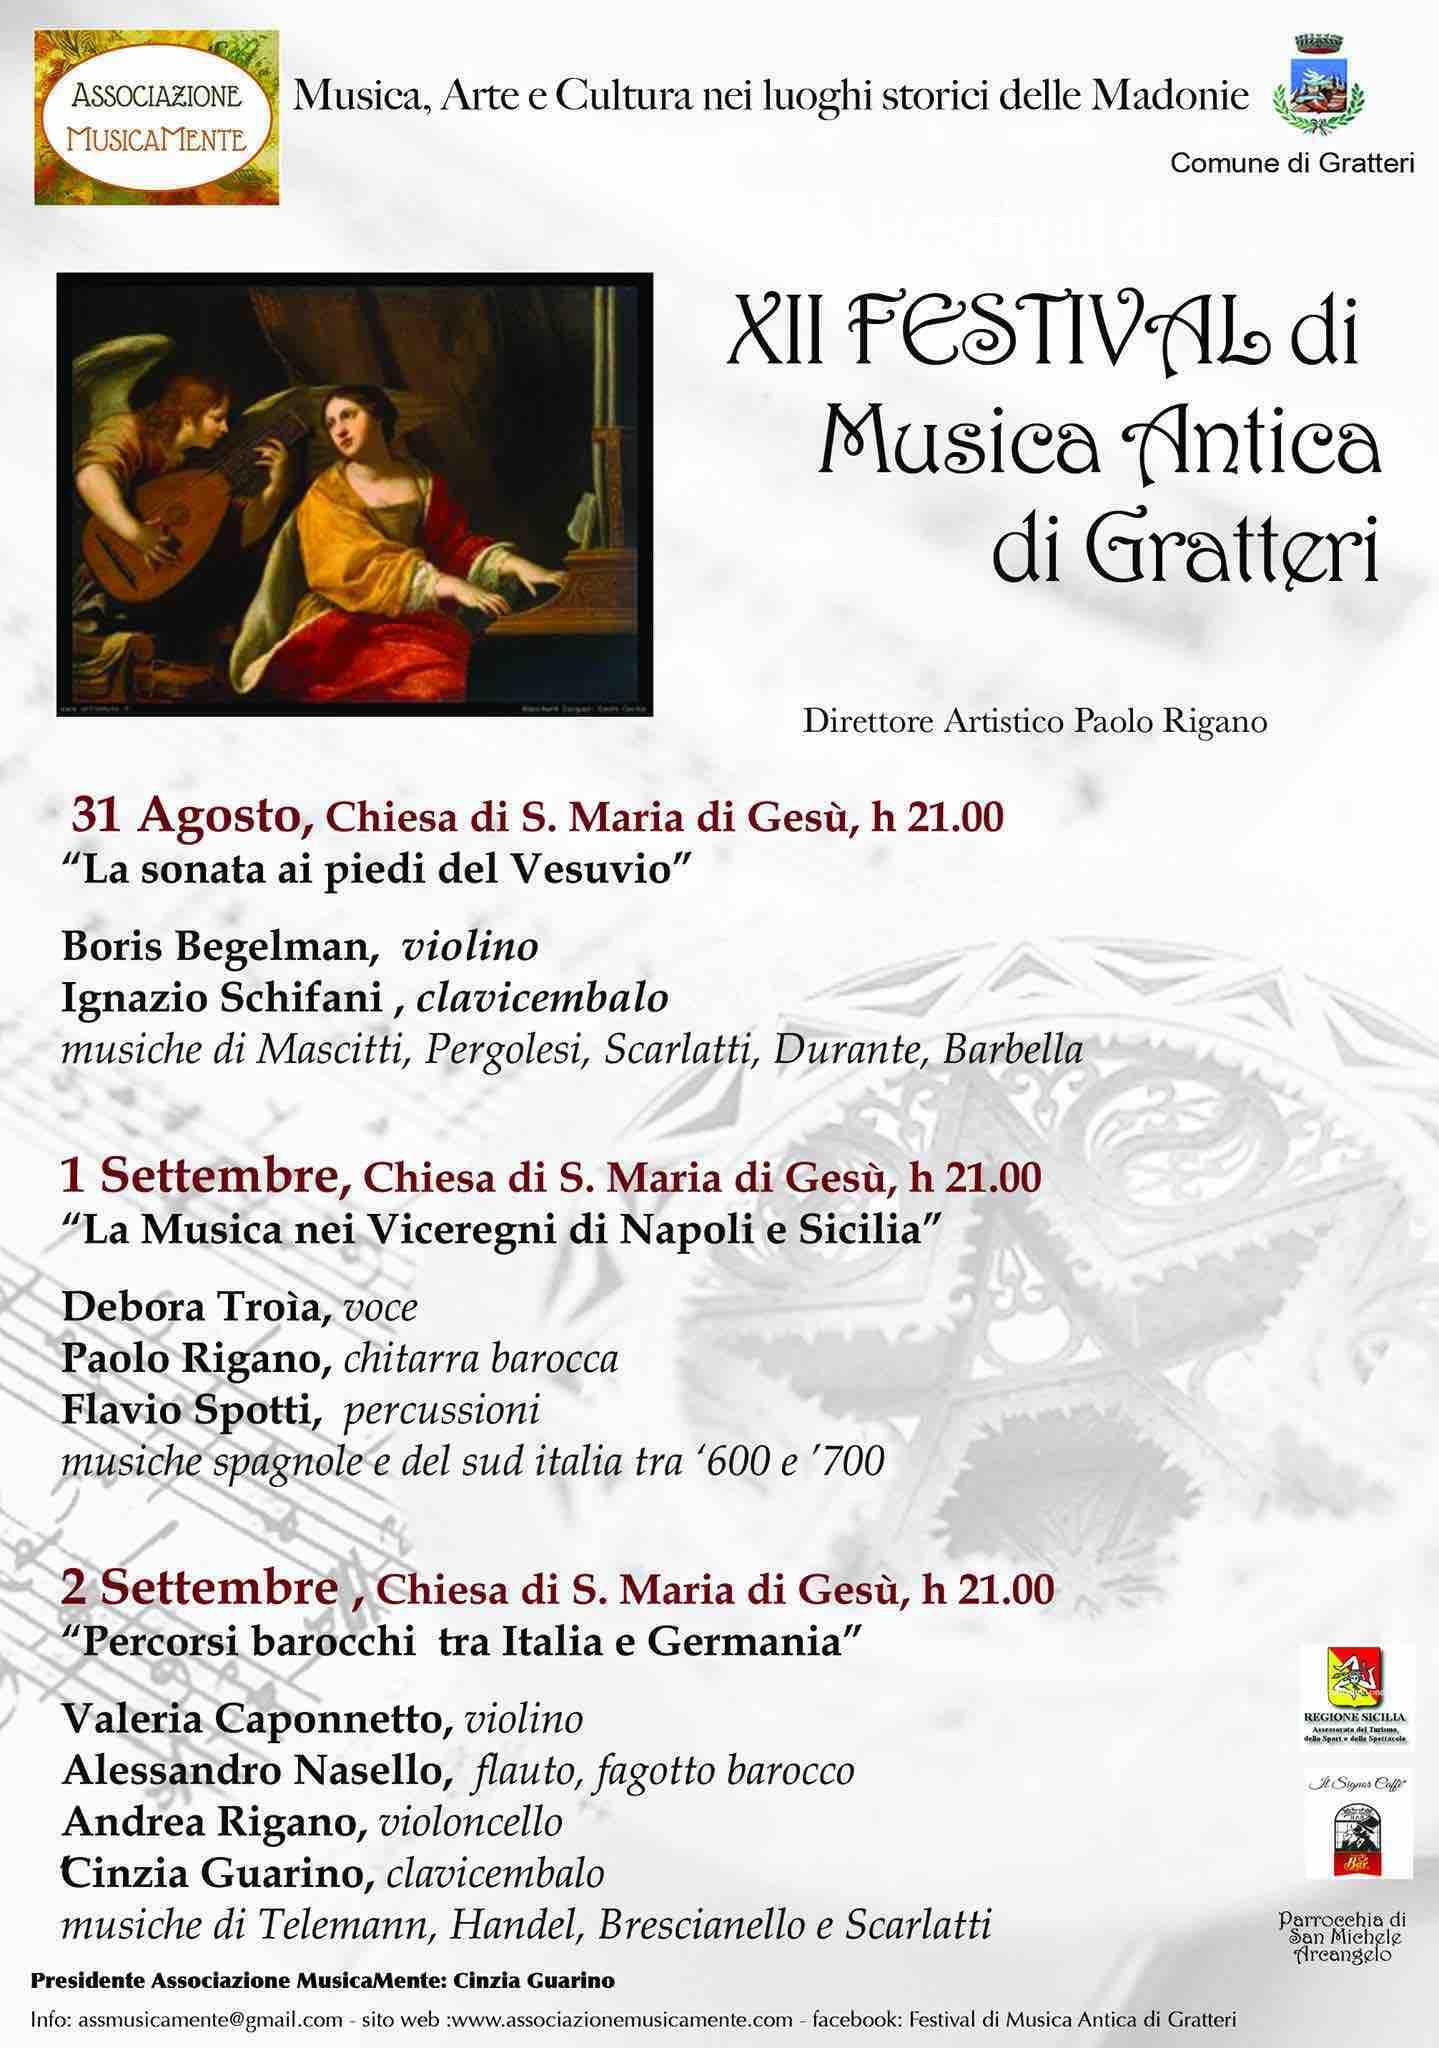 12° Festival di Musica Antica di Gratteri